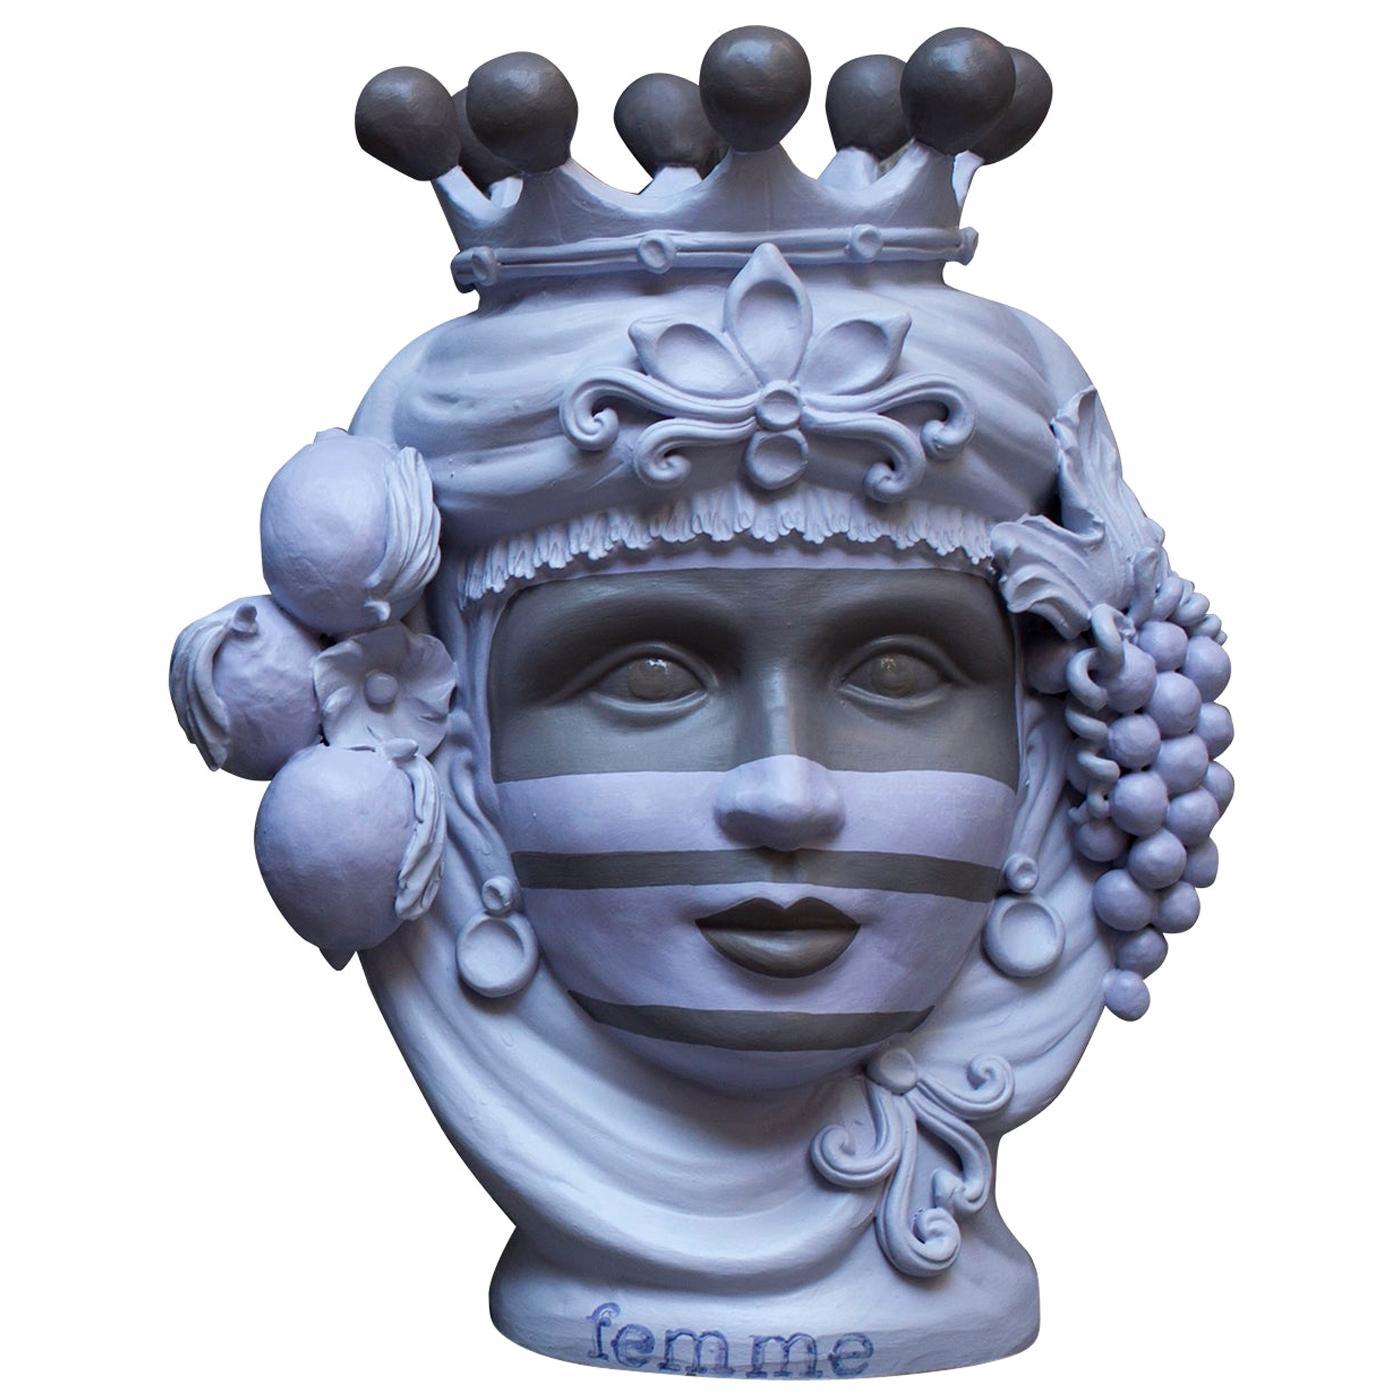 Matte Mauve Sicilian Terracotta Vase Designed by Stefania Boemi